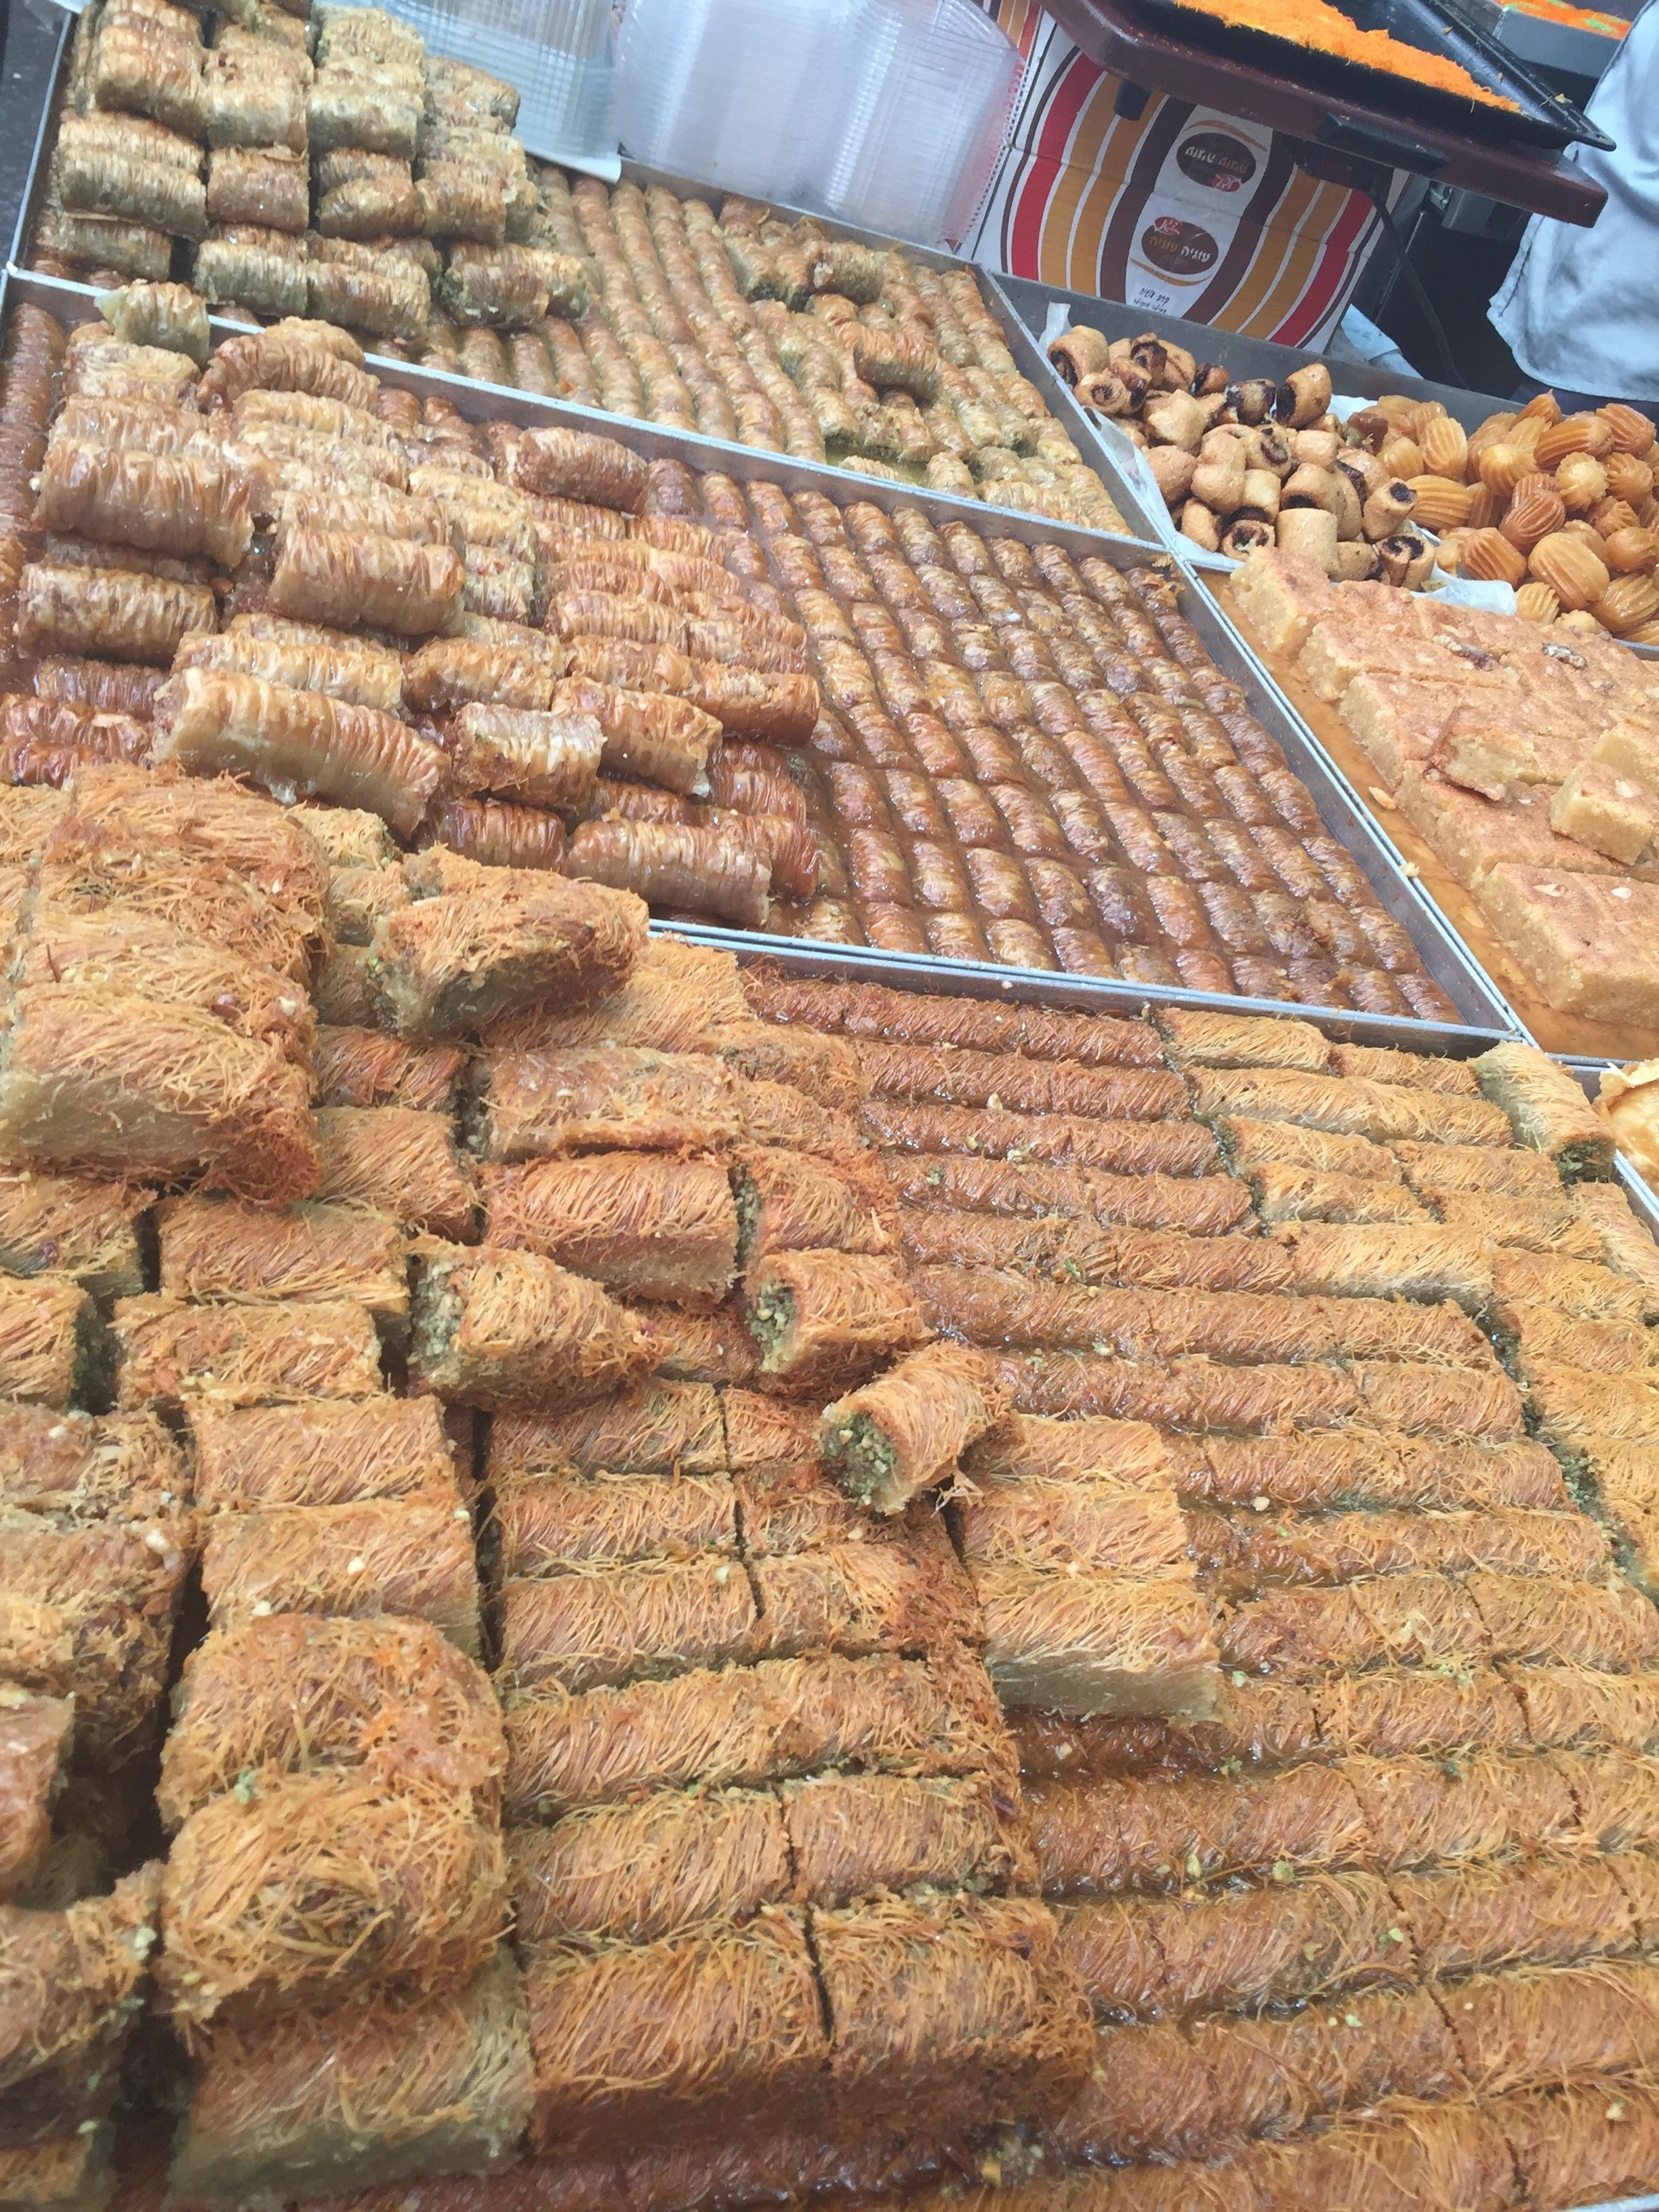 Every imaginable type of baklava